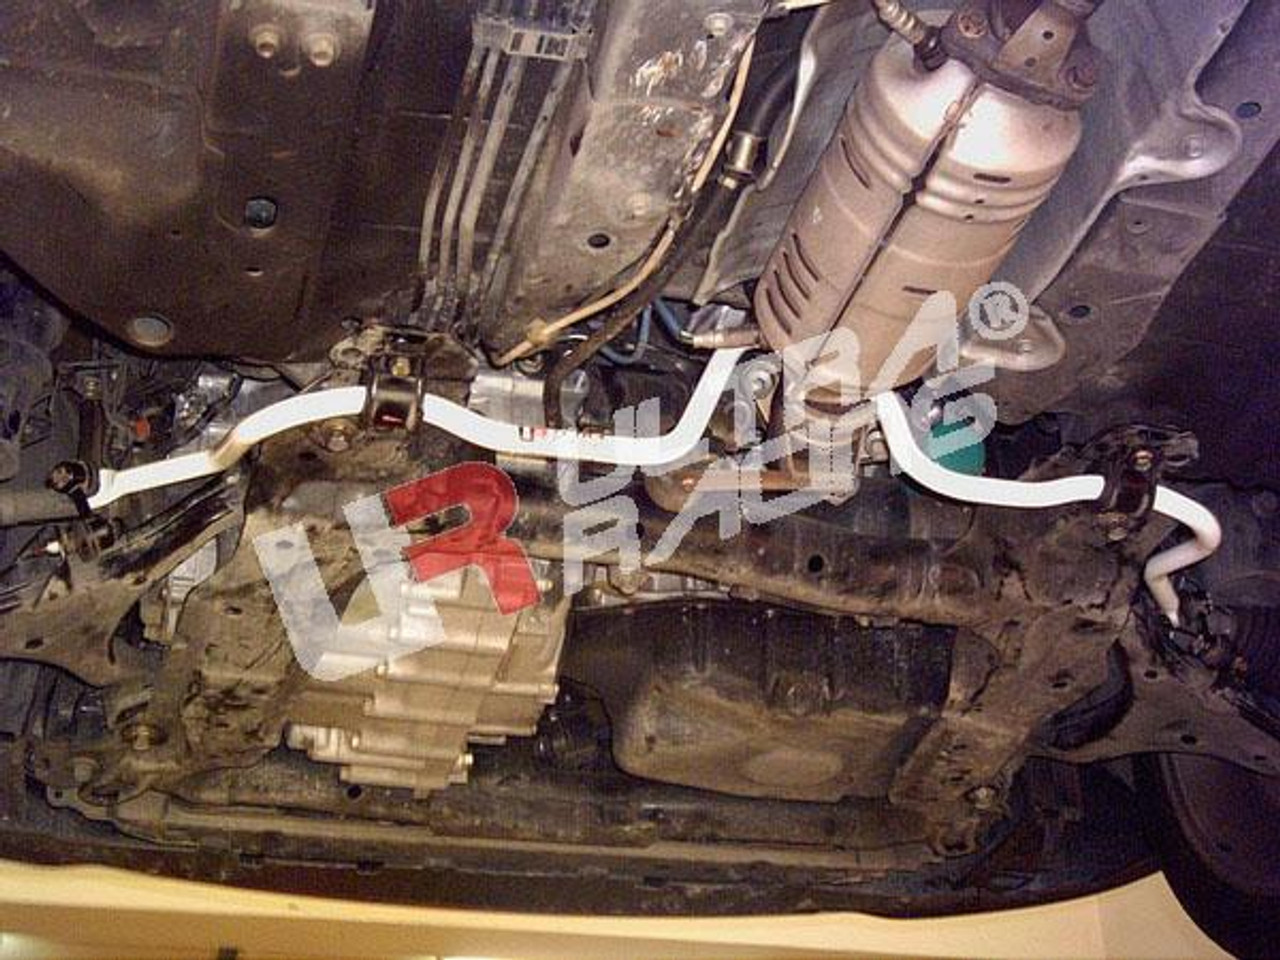 UR-LA4-157 HONDA CIVIC ES 1.7 2.0 EP3 DC5 ULTRA RACING 4 POINT FRONT LOWER BAR